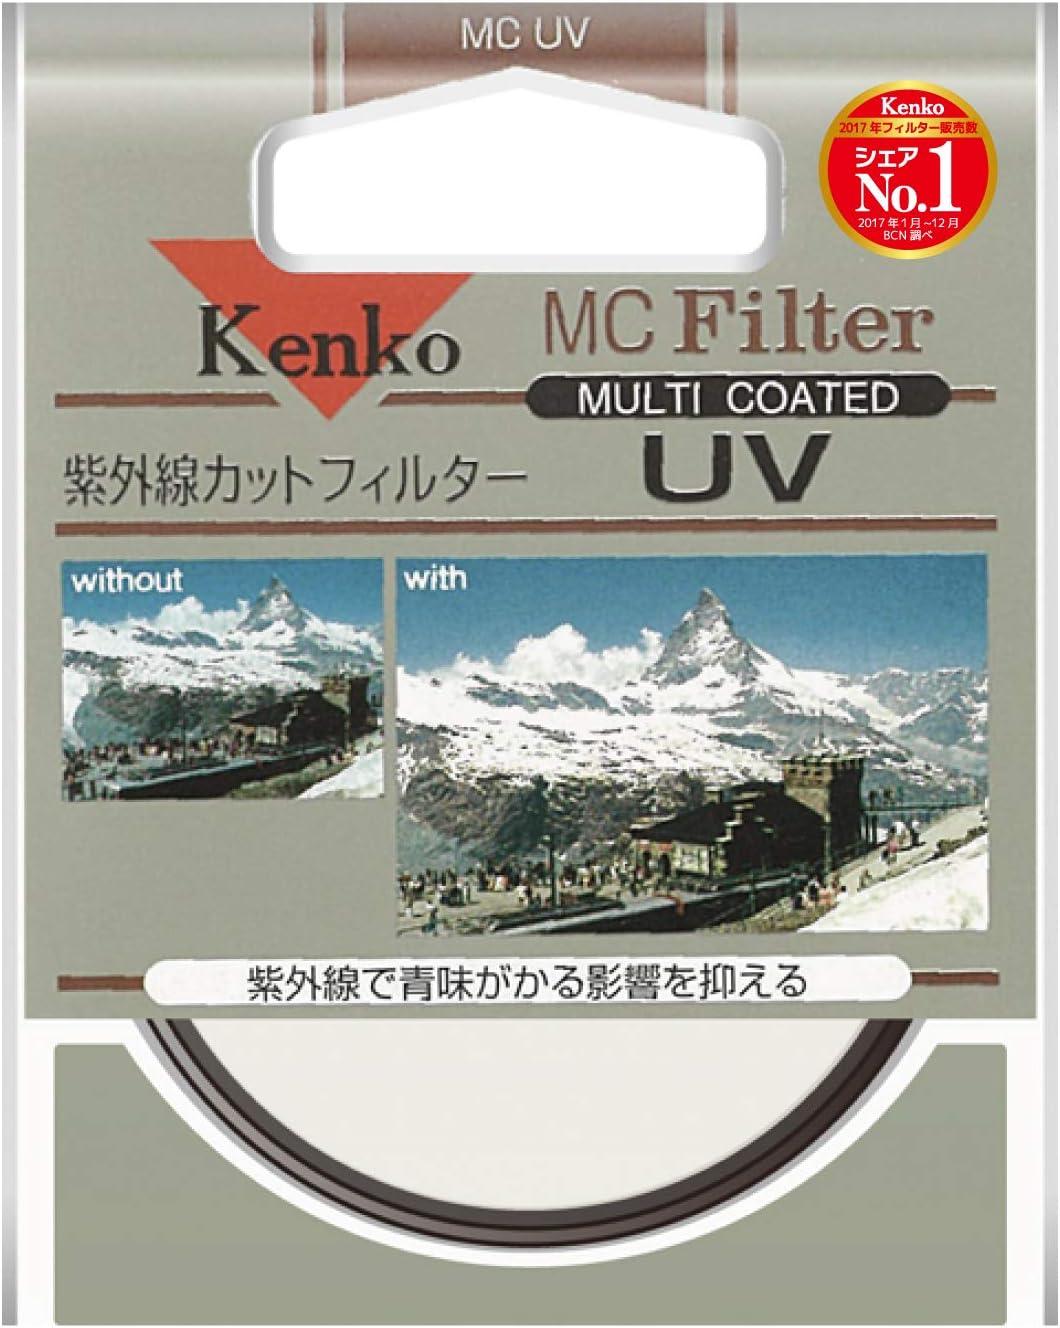 Multi-Coated SL-39 Optical Glass Filter Made in Japan Kenko-Tokina 58mm UV